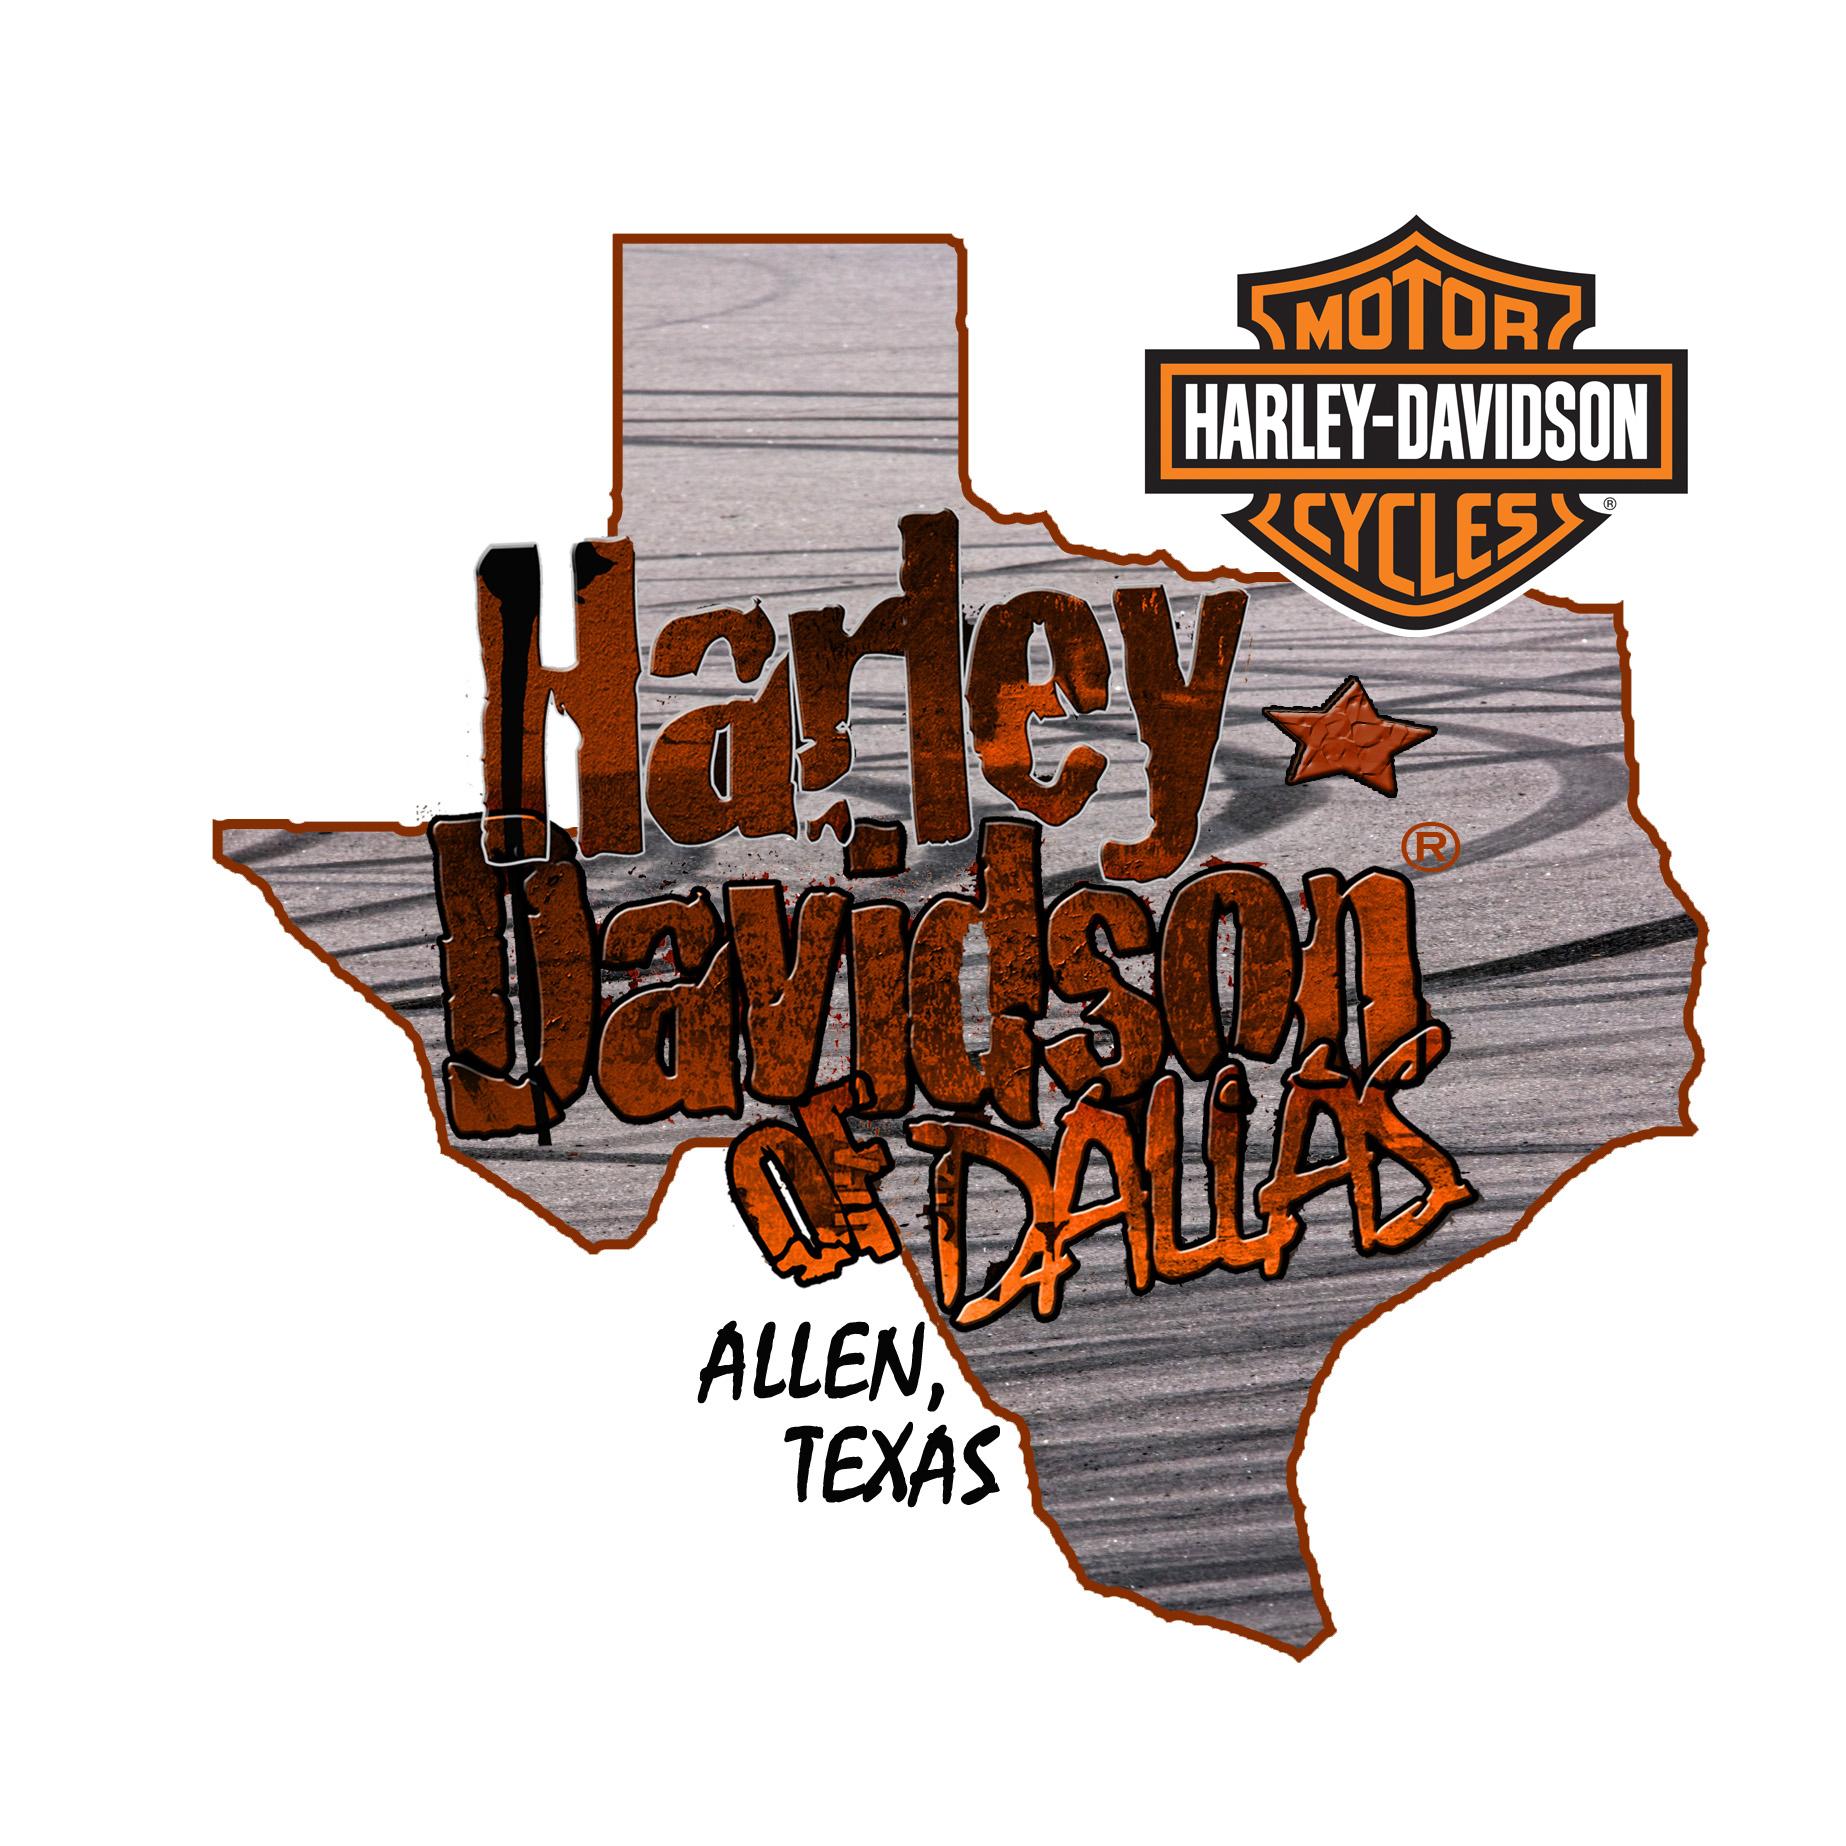 Harley-Davidson Of Dallas Inc - Allen, TX 75013 - (214) 495-0259 | ShowMeLocal.com